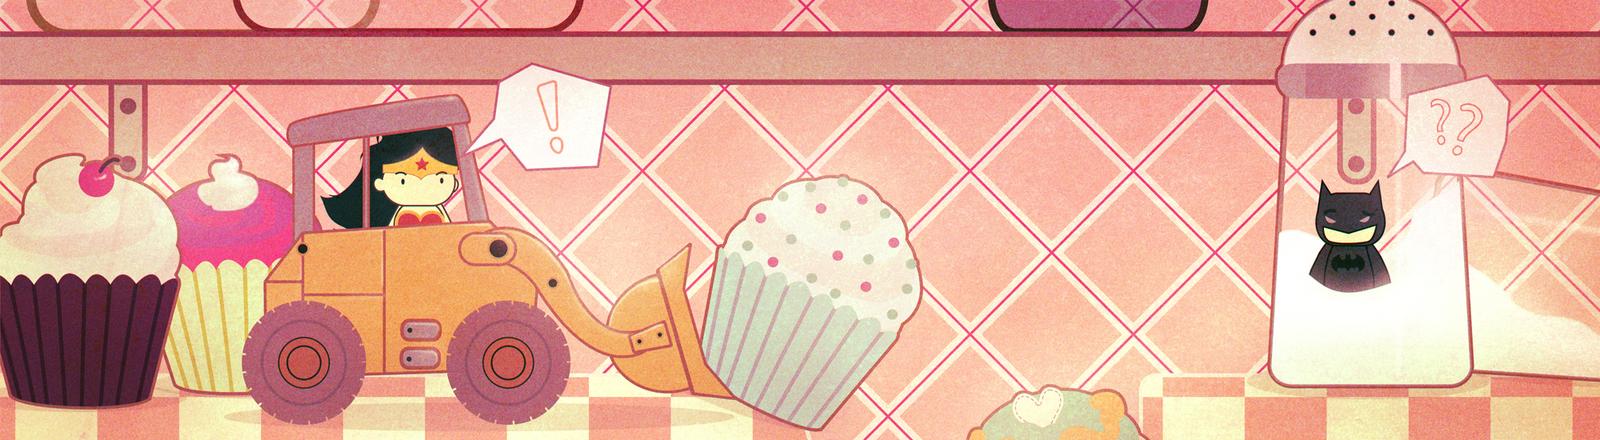 Kitchen Antics by Peppermint-Pinwheel